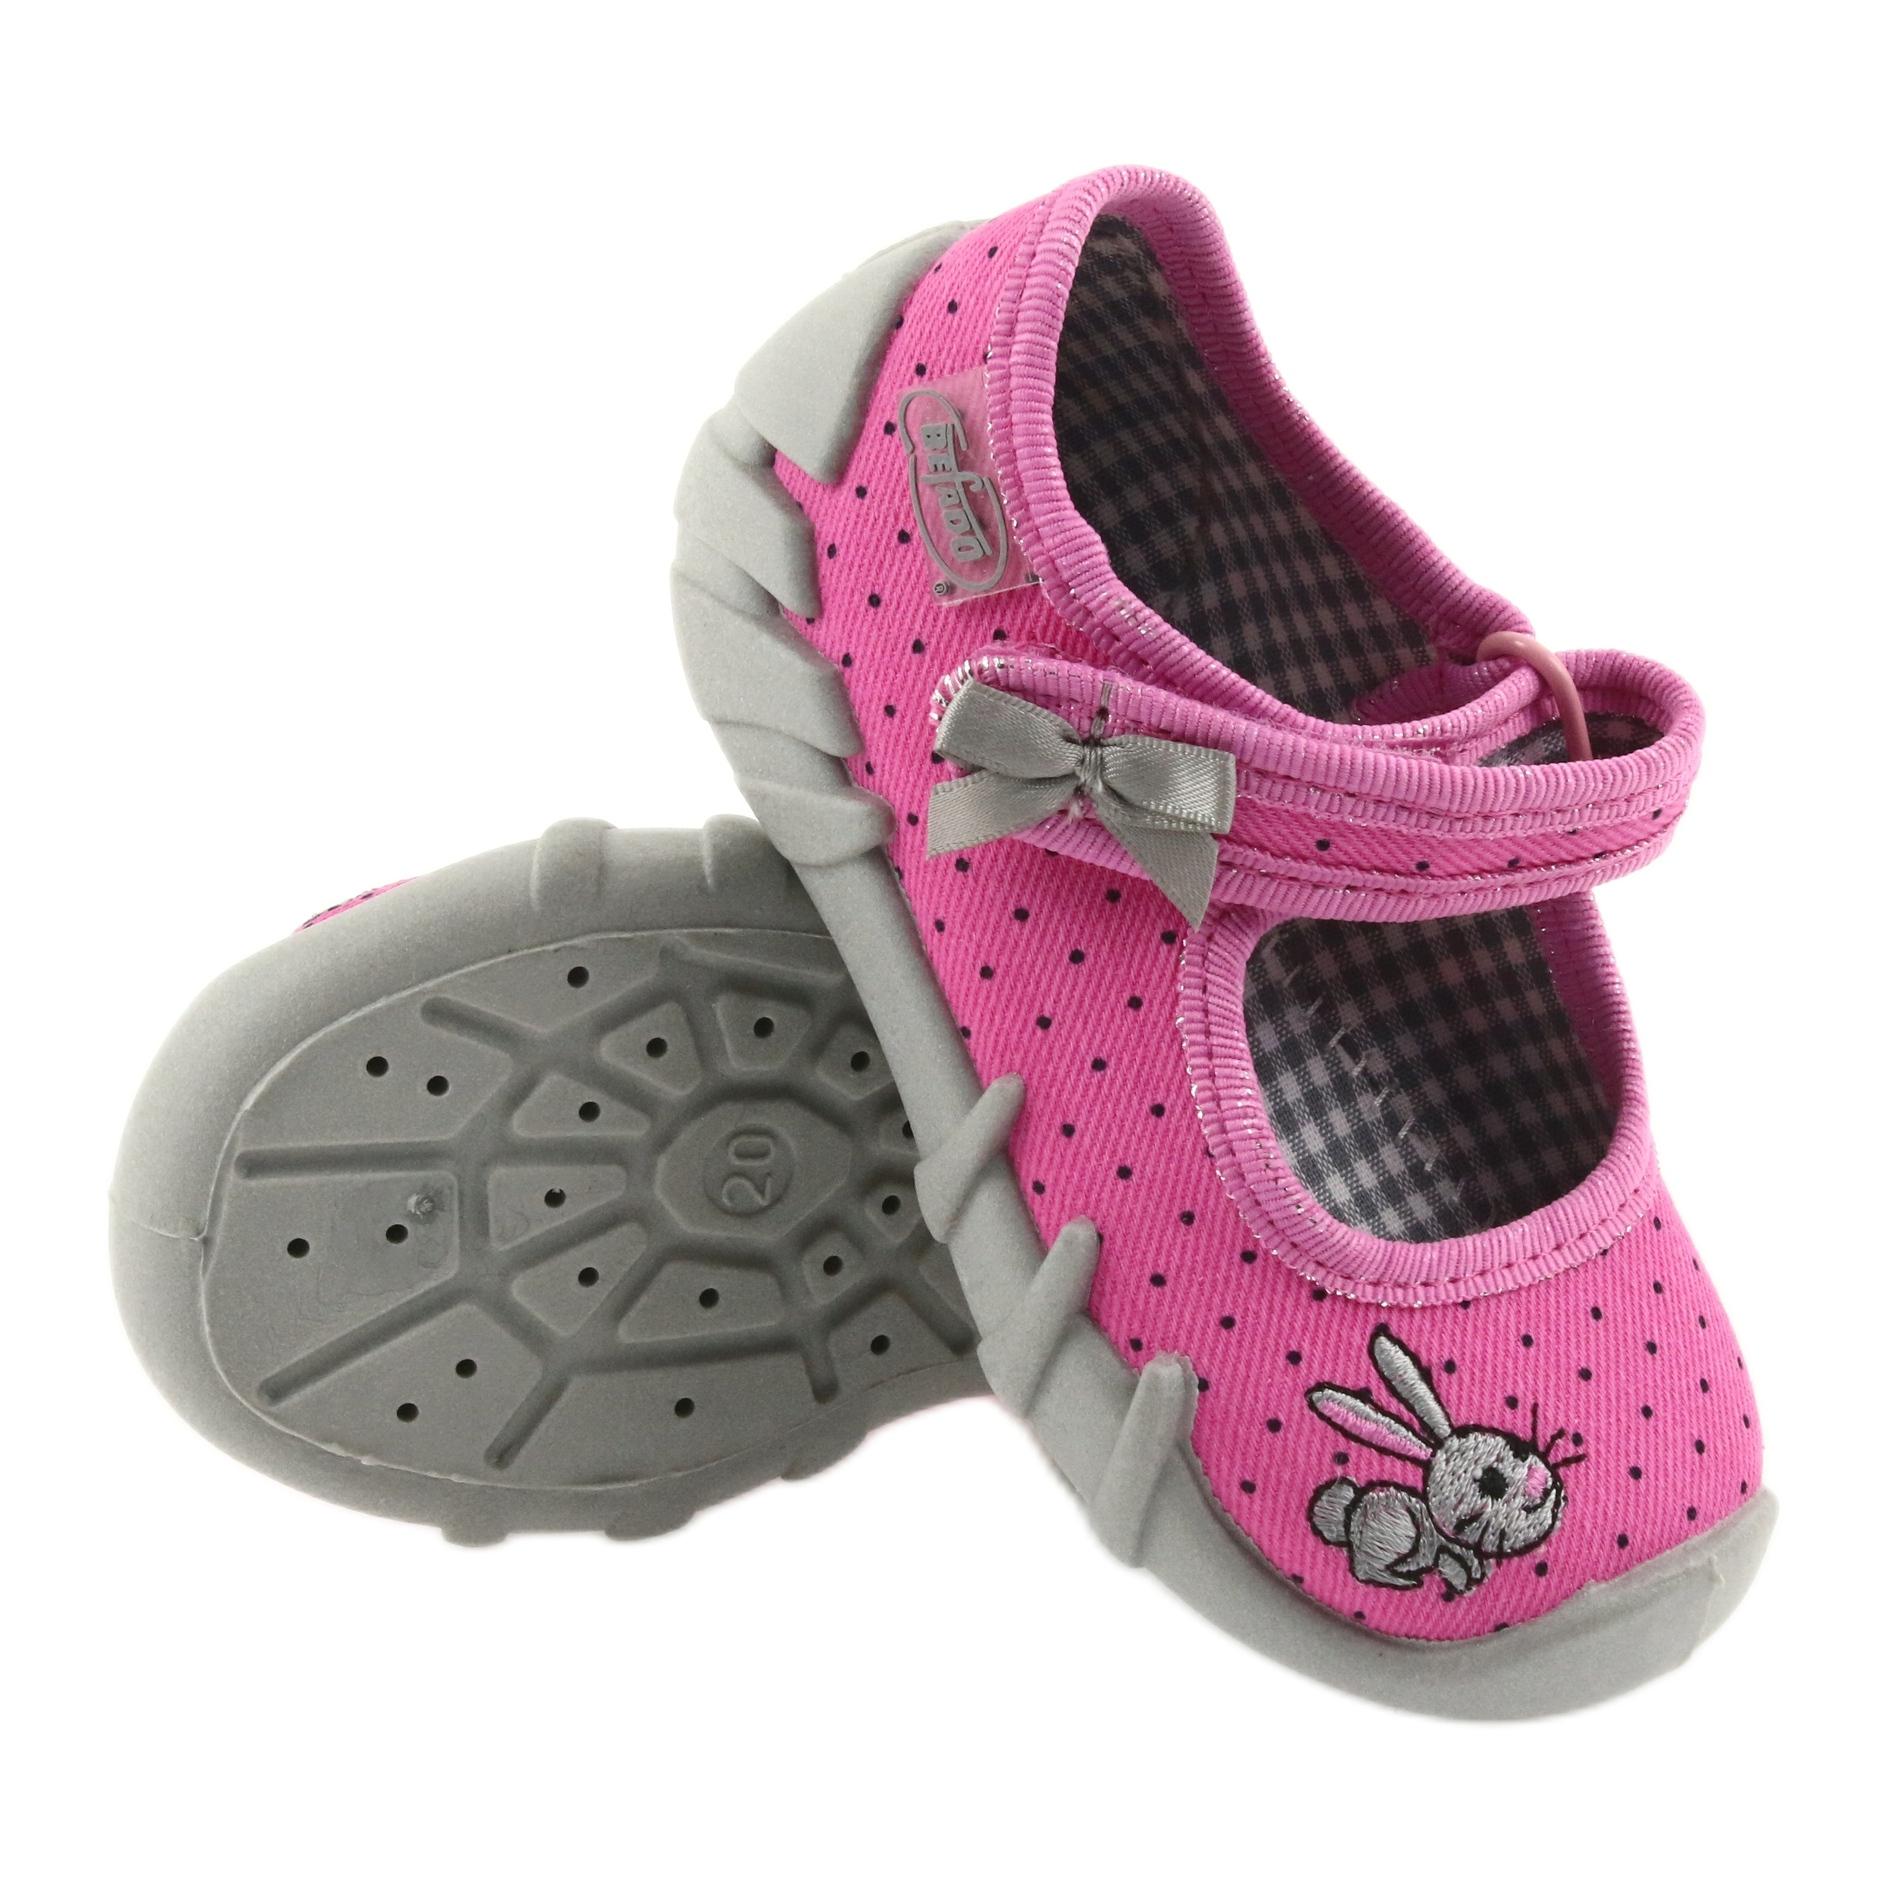 miniatura 4 - Pantofole da ballerina Befado per bambini 109P169 nero grigio rosa